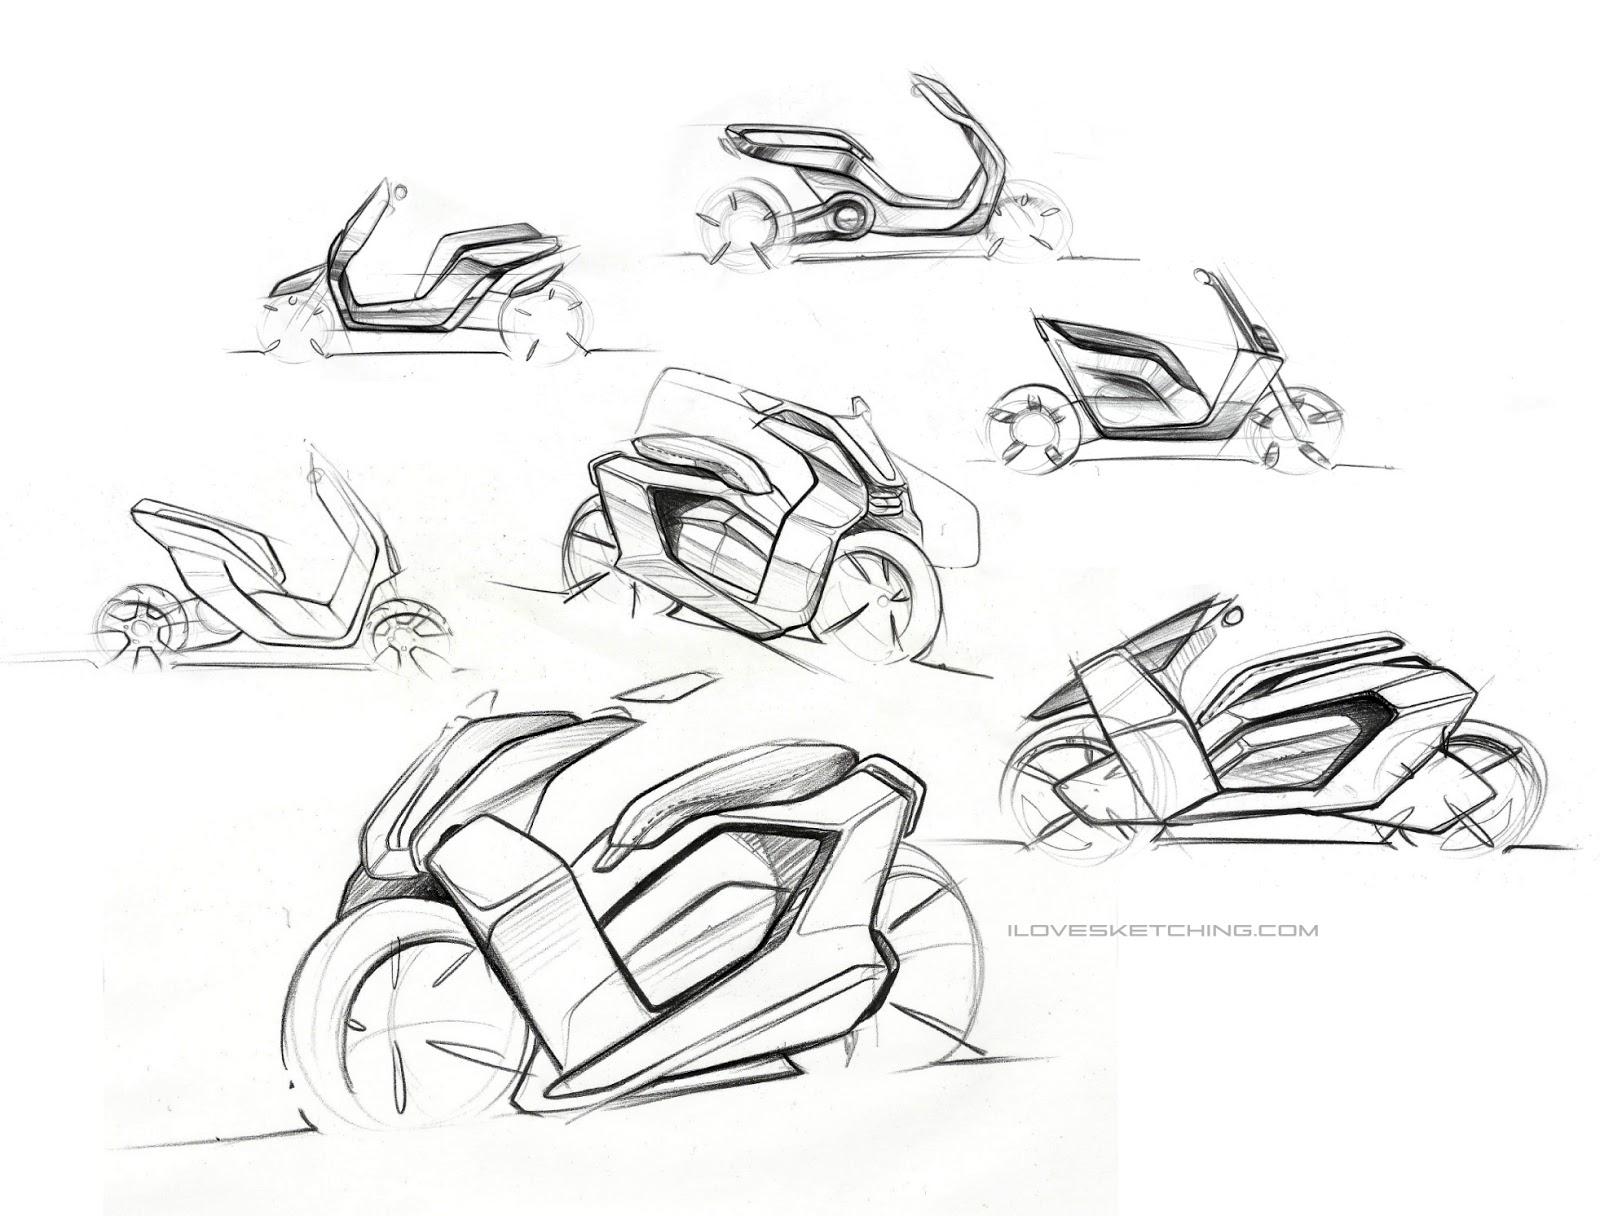 I Love Sketching Volturo